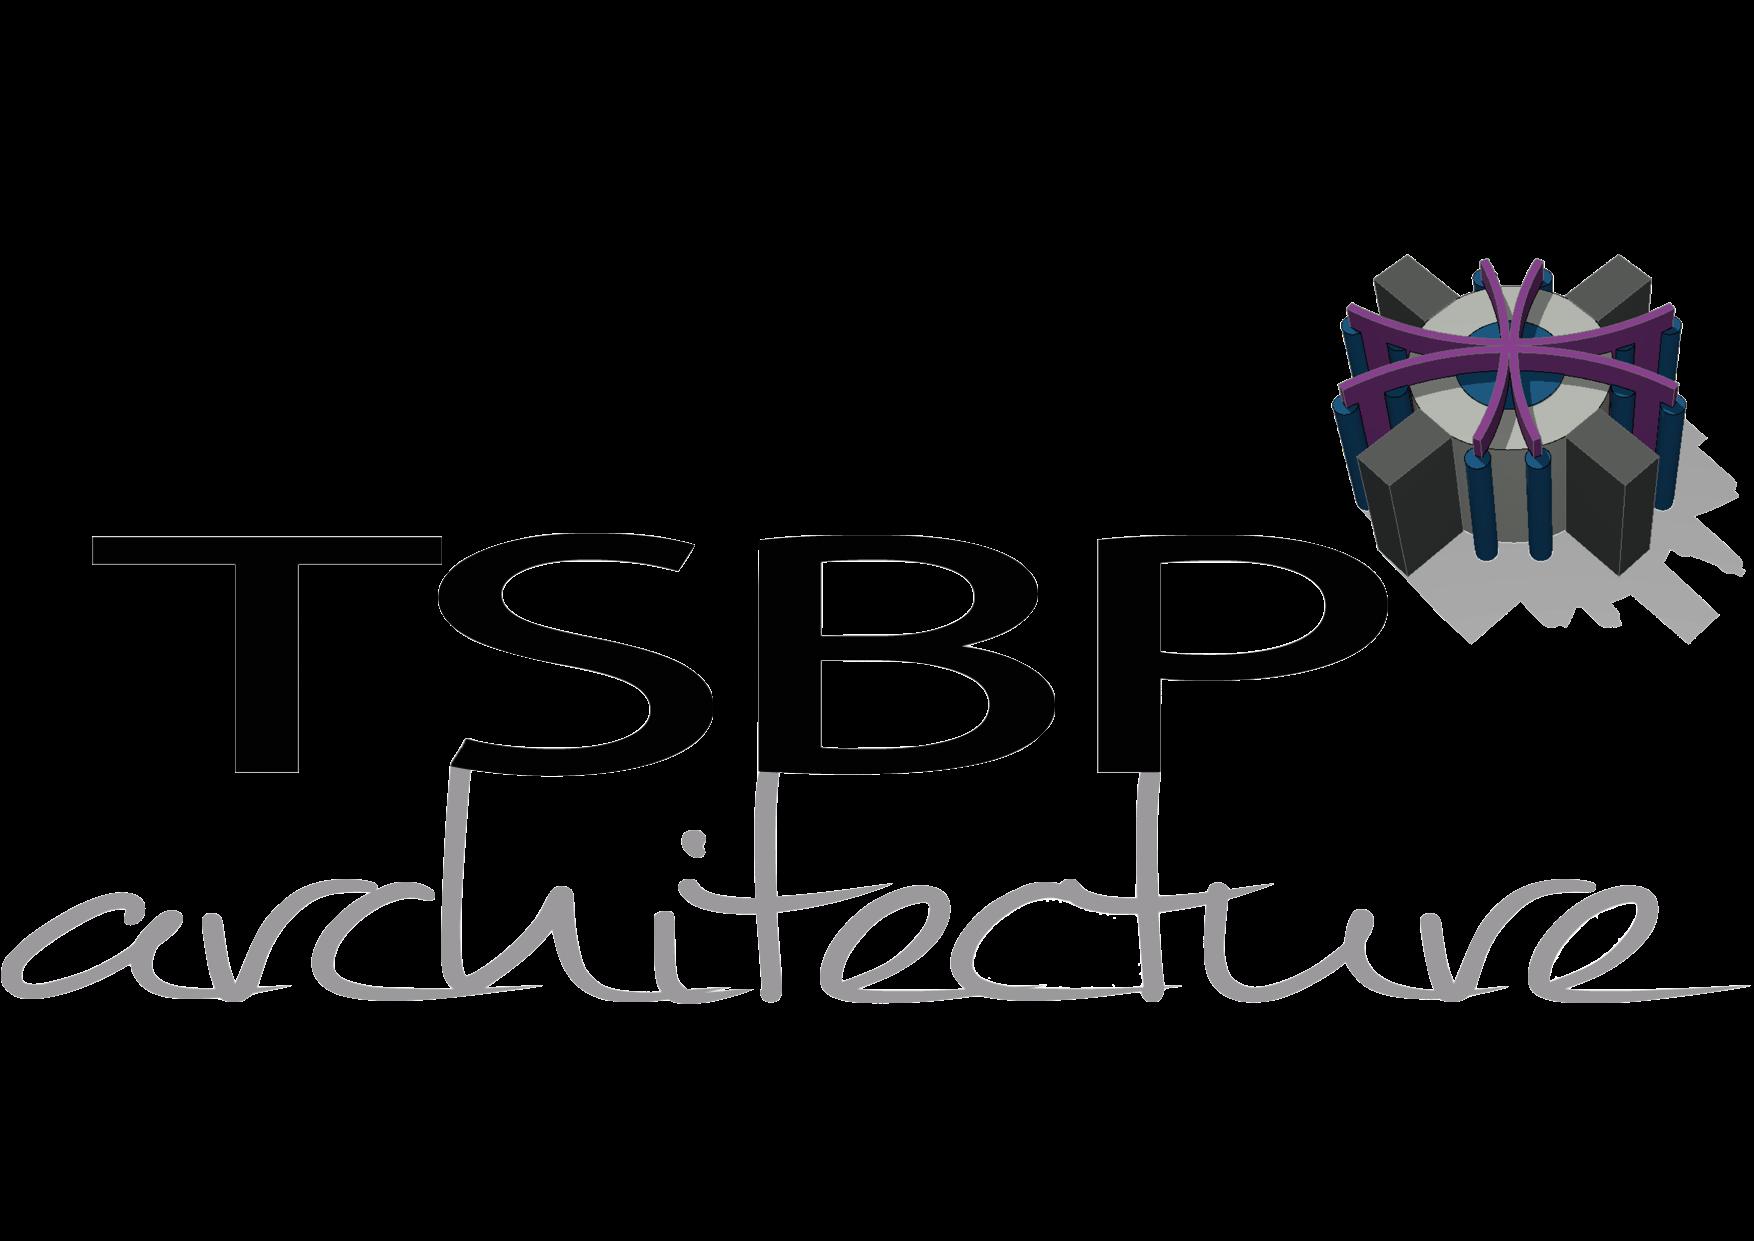 TSBP Architecture